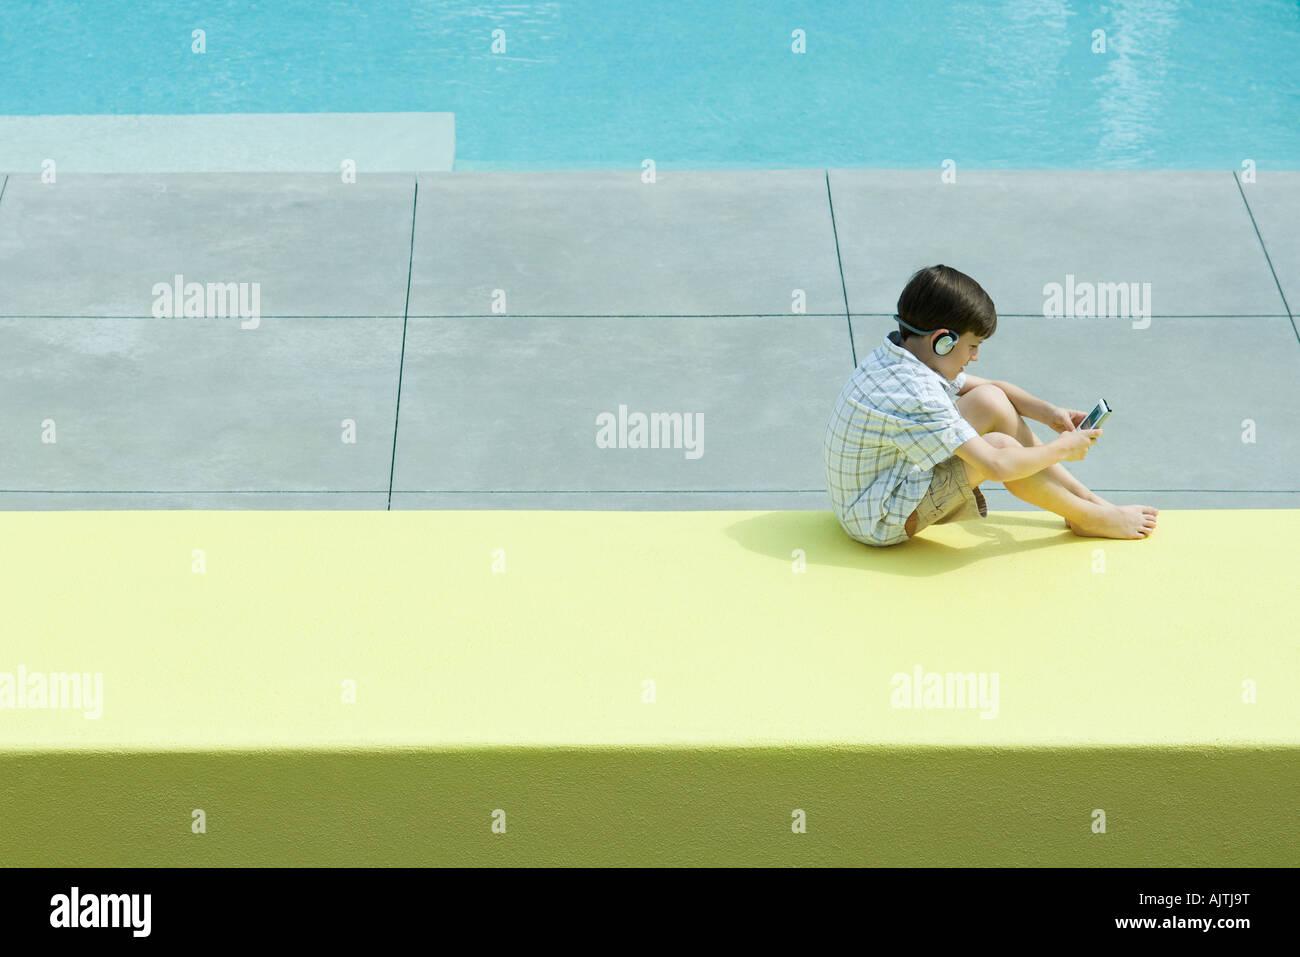 Boy sitting next to swimming pool, using handheld video device, wearing headphones Stock Photo